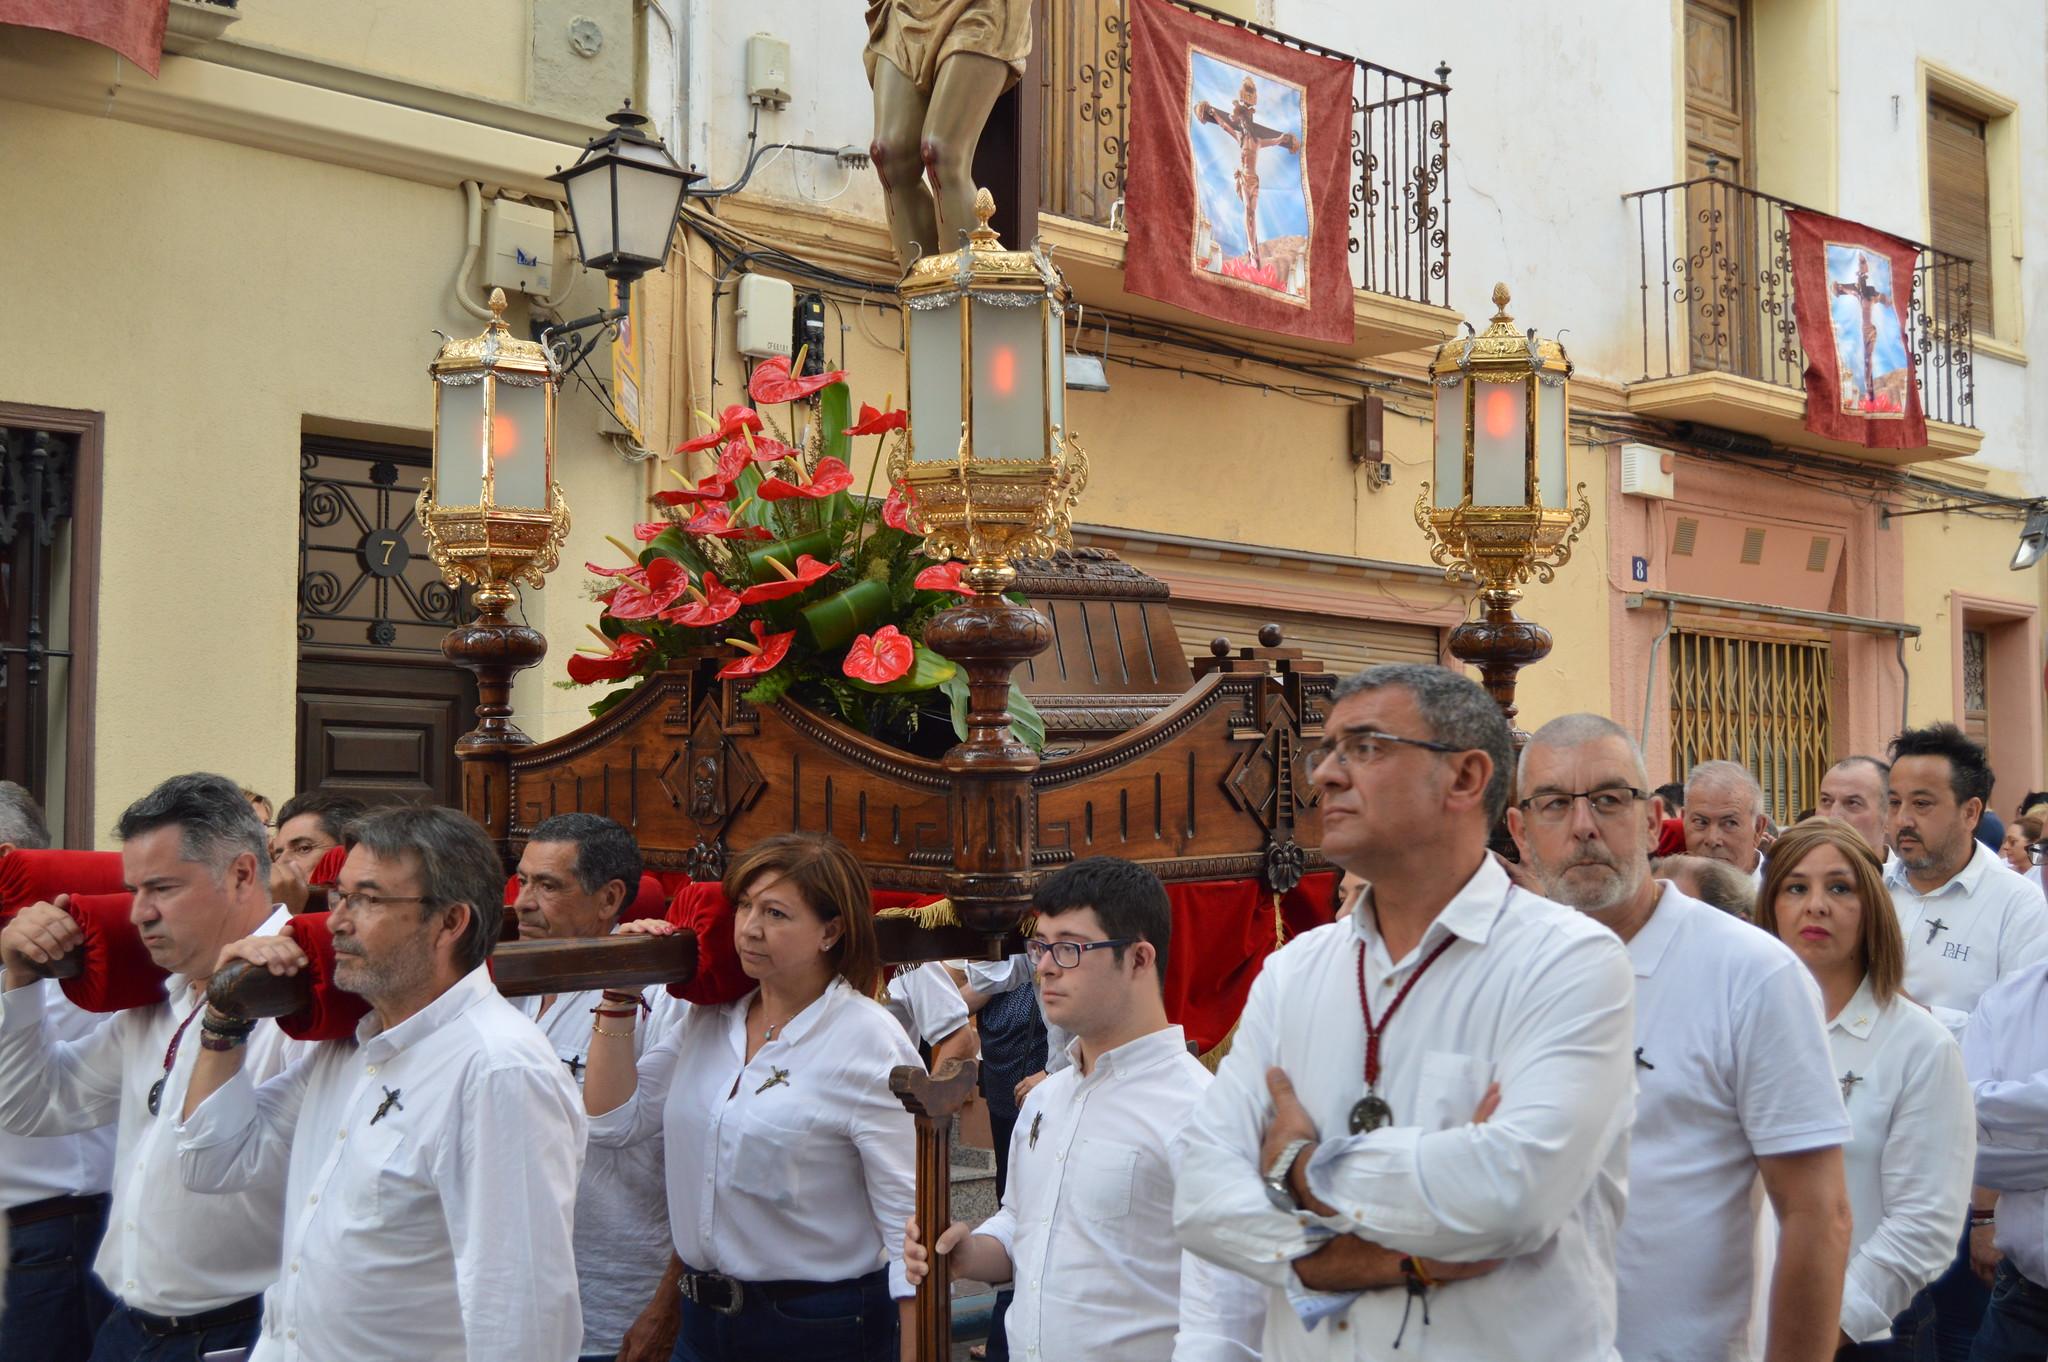 (2019-07-07) Procesión de subida - Adrián Romero Montesinos (03)